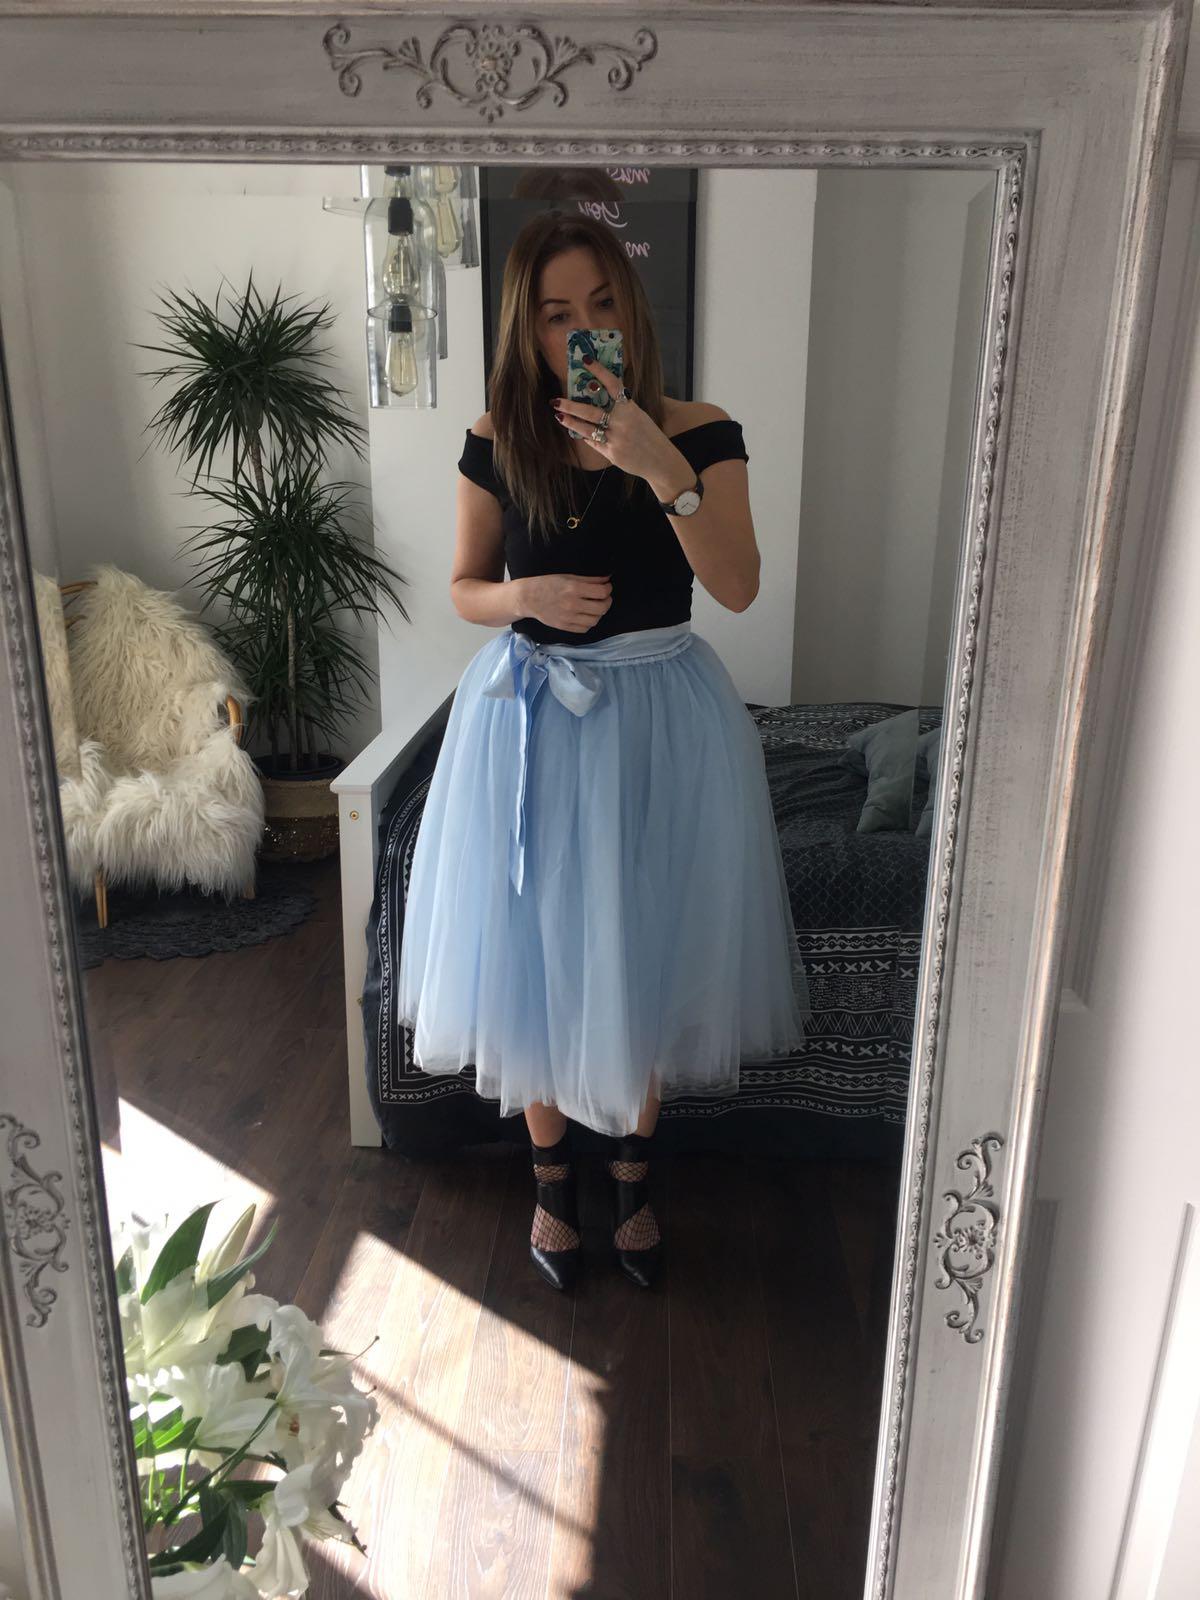 b5a3401a1 Baby Blue Midi Tulle Tutu Skirt - Elsie's Attic